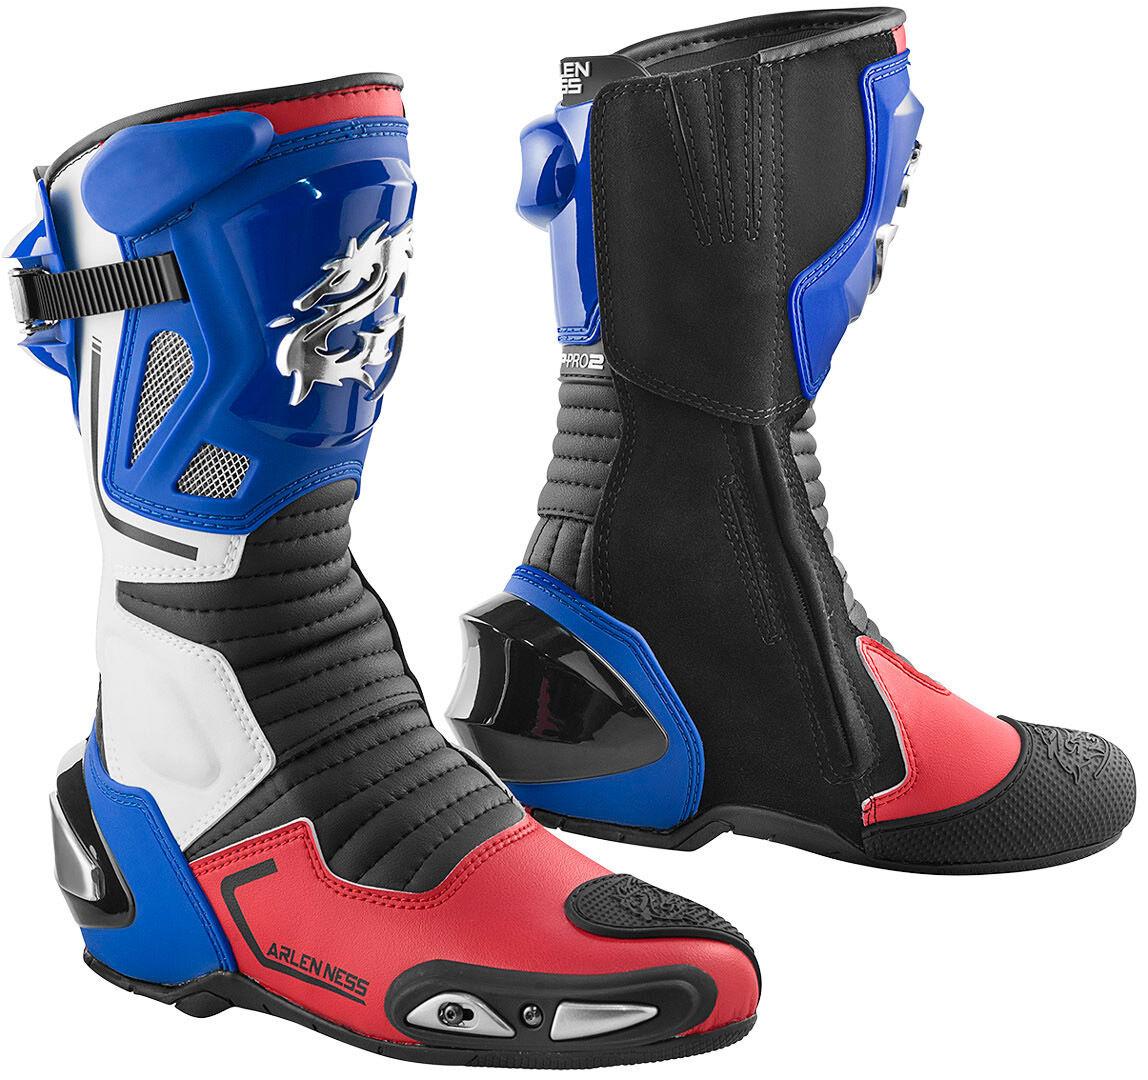 Arlen Ness Sugello Bottes de moto Blanc Rouge Bleu taille : 38